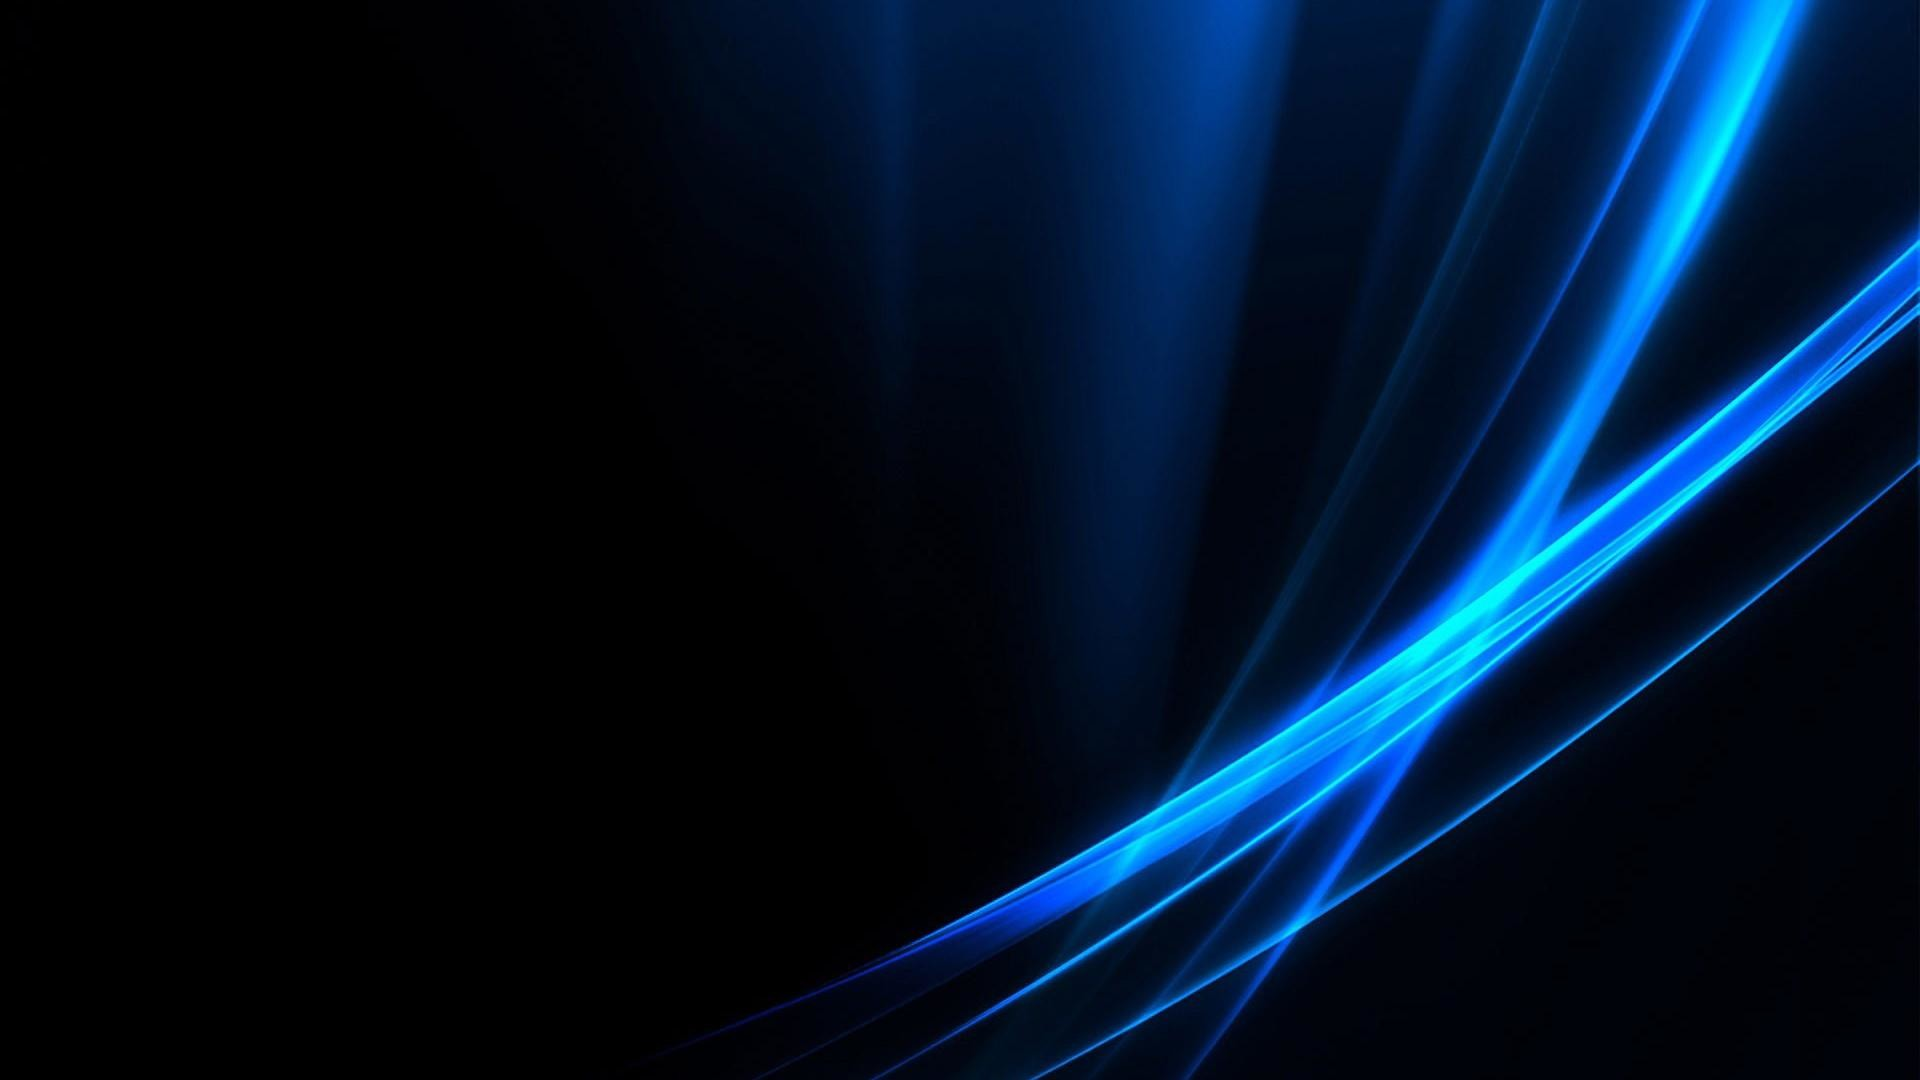 1920x1080, Herunterladen   Data Id 60601   Data Src - Windows 10 Wallpaper Dark - HD Wallpaper